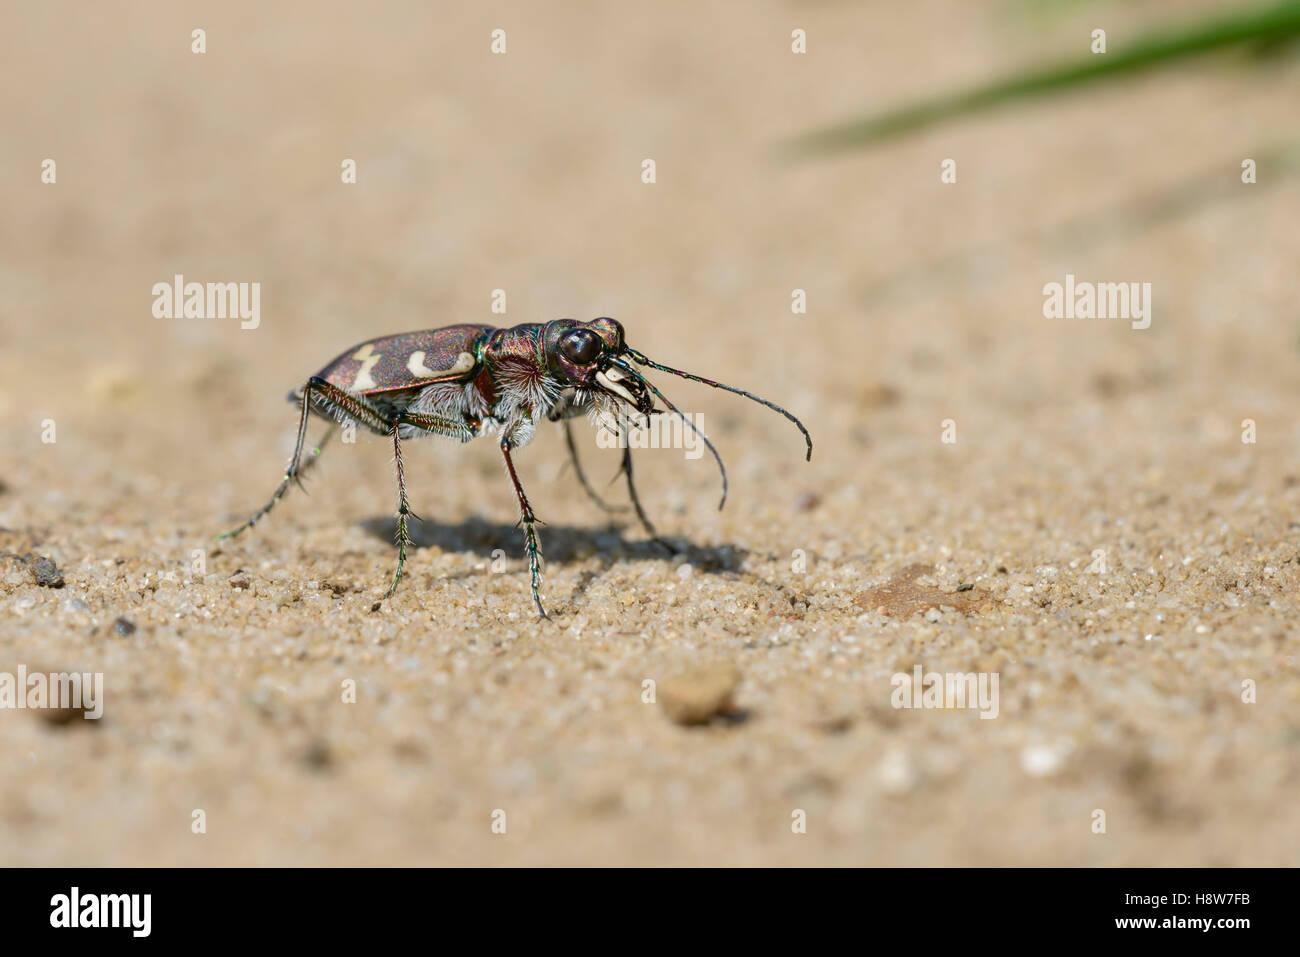 Duenen Sandlaufkaefer, Cicindela hybrida, Northern Dune Tiger Beetle - Stock Image